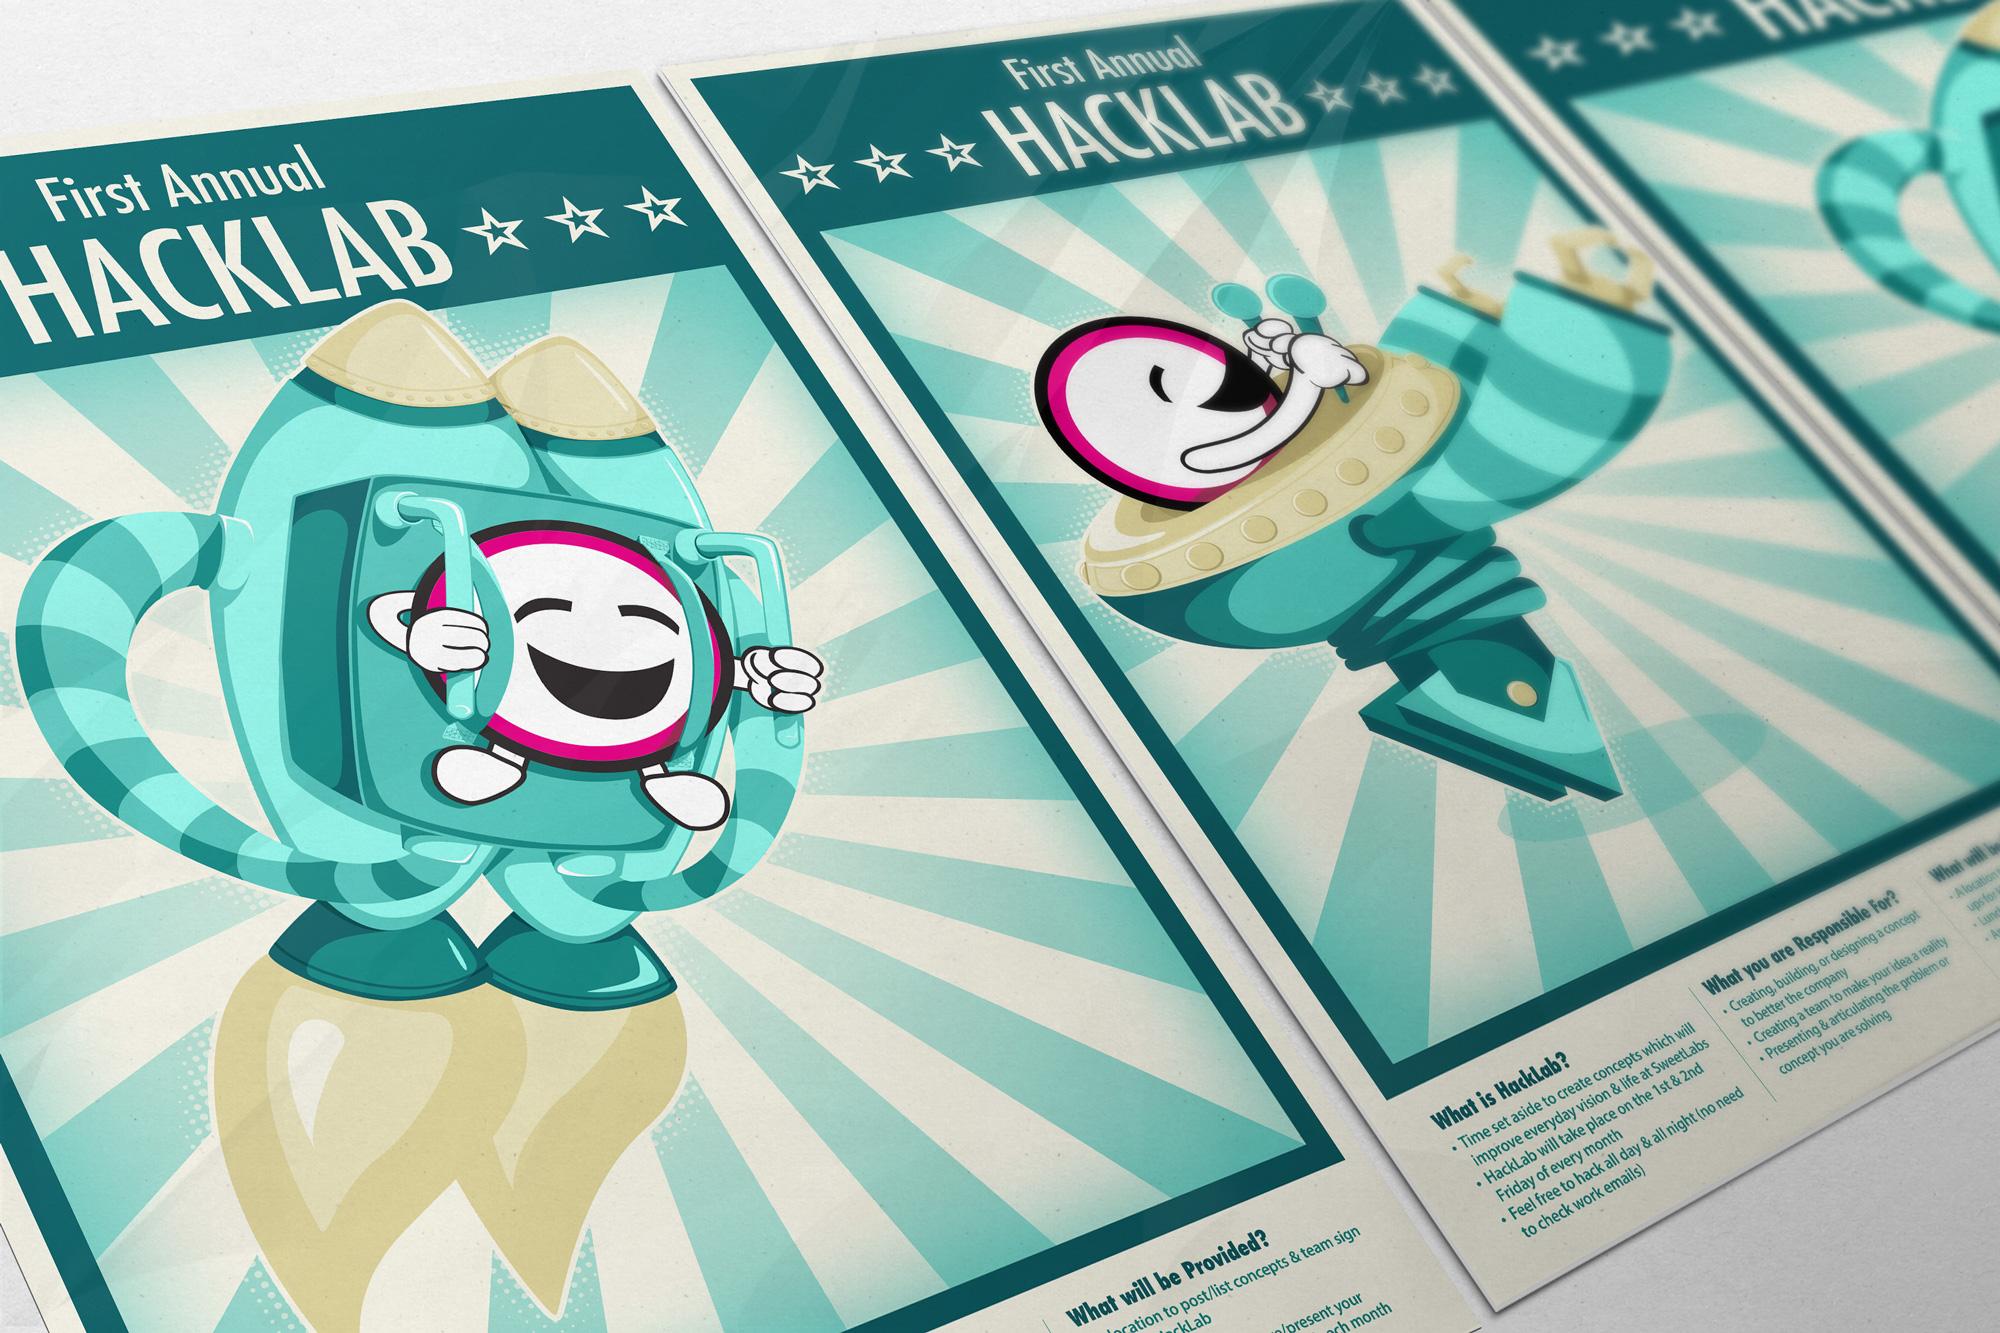 Hacklab Posters